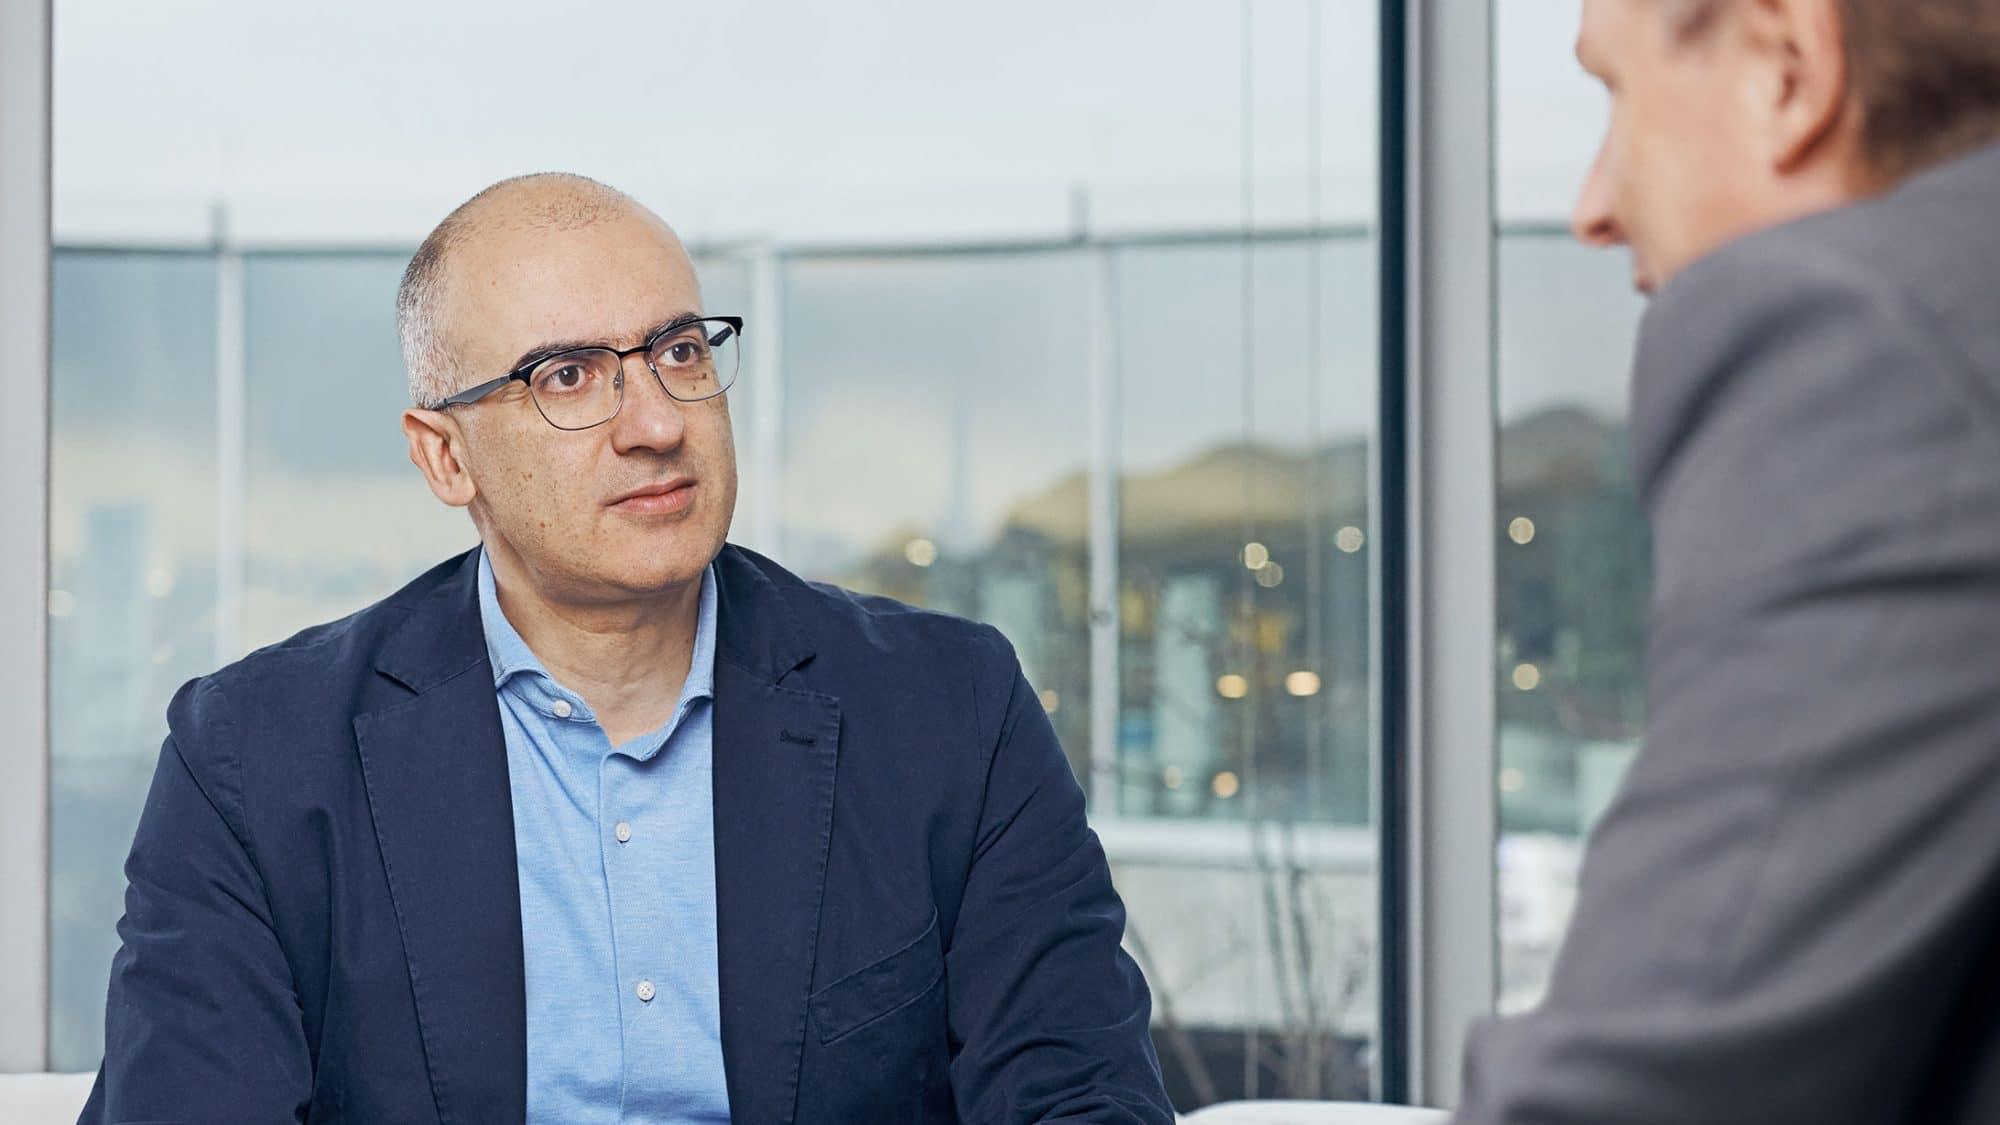 Mario Paolone im Interview mit Smart-Redaktor Andreas Turner